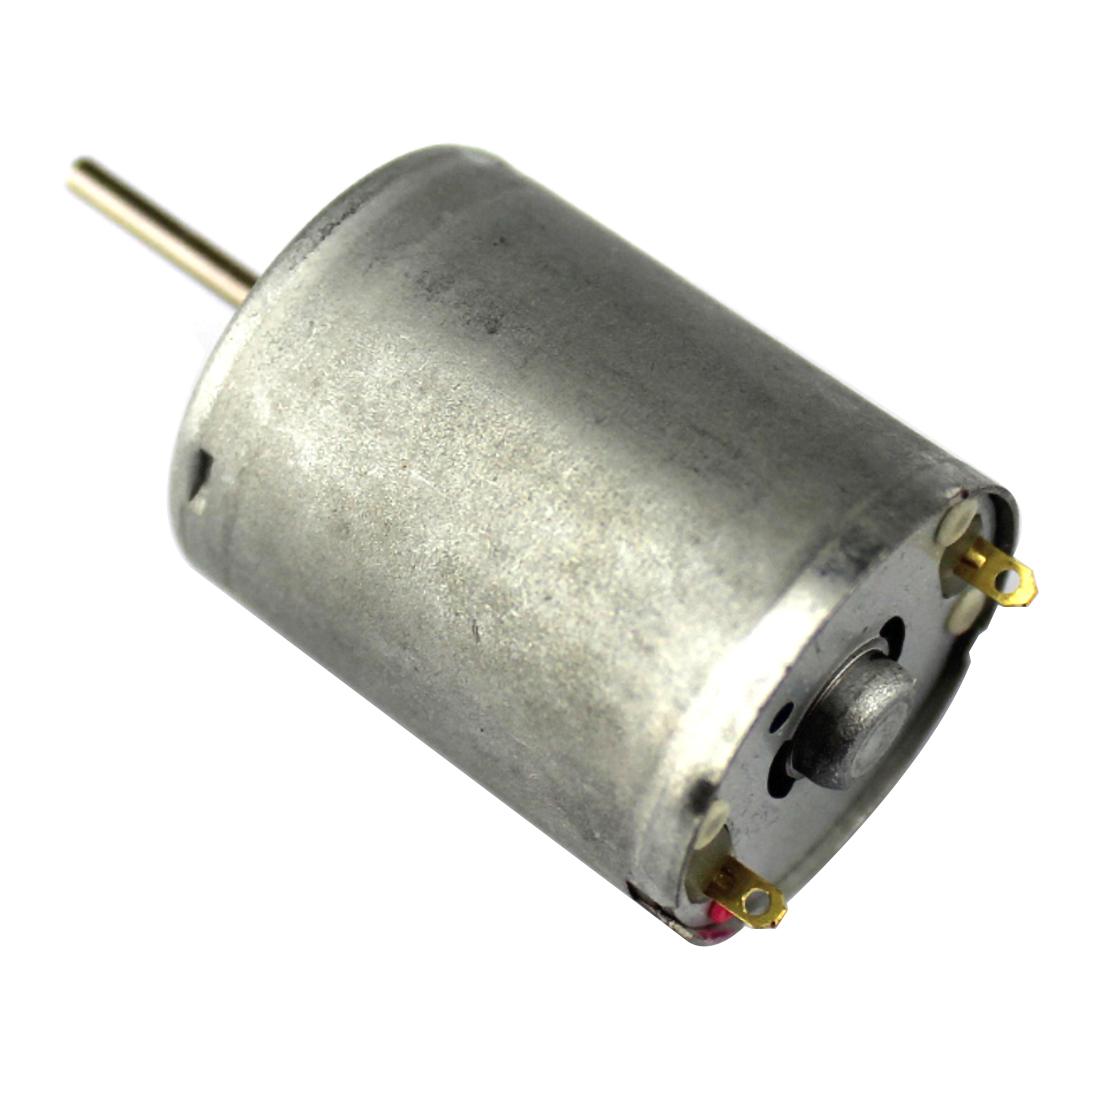 4PCS Feichao Long Axis 370 Motor Model Electric Motor High Torque Car Model  Motor Micro DC Motor 8V